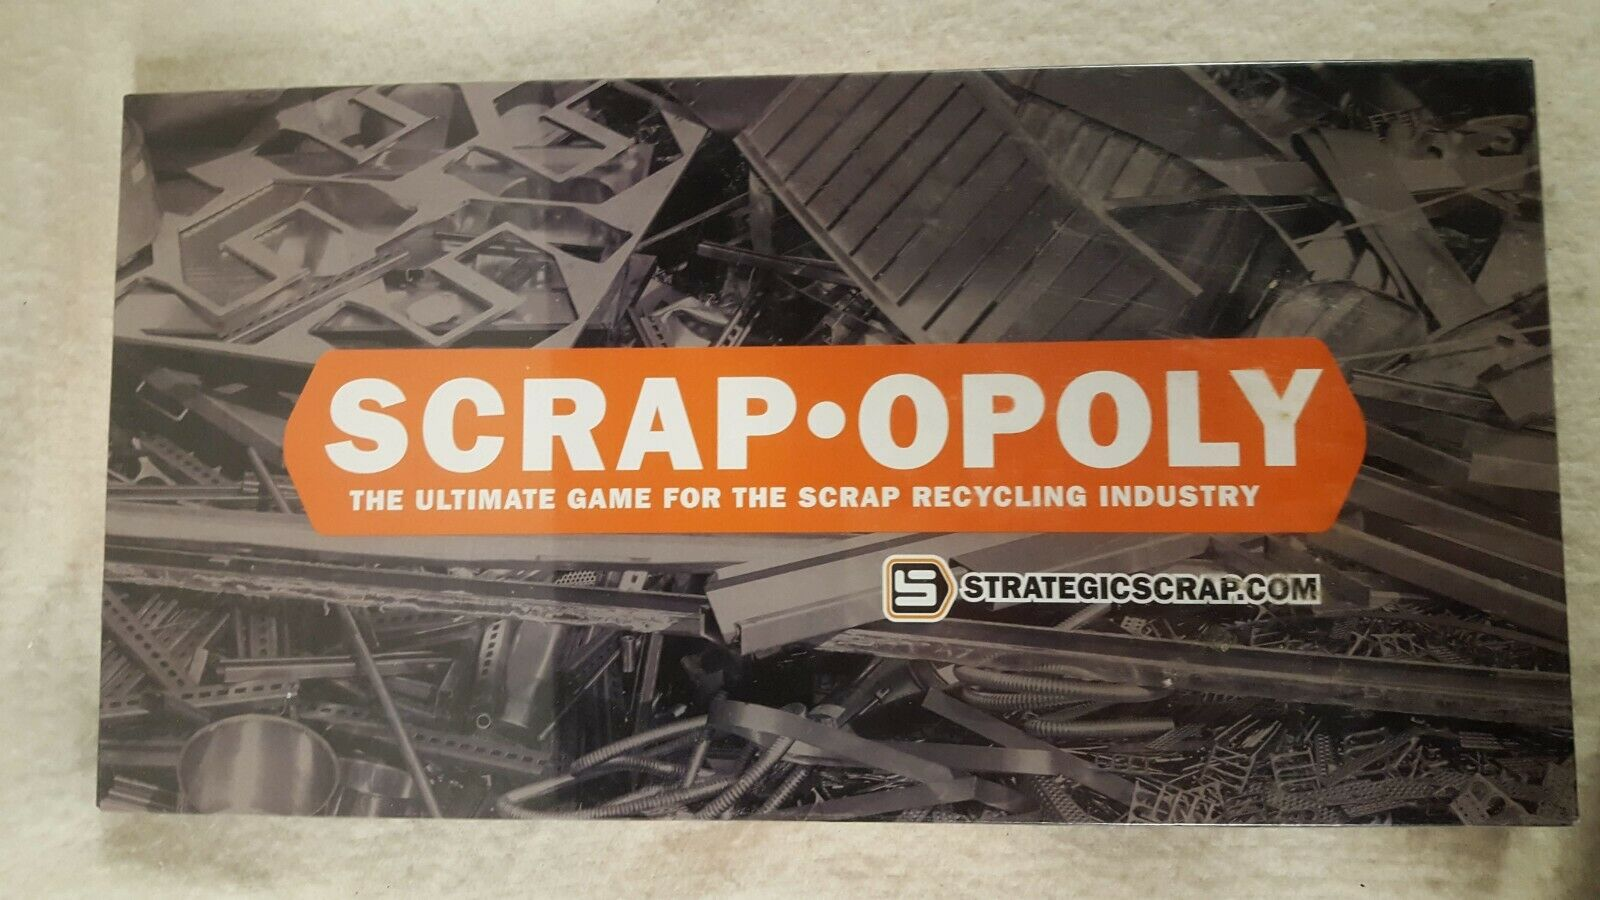 Scrap Opoly Scrapopoly Monopoly Game Recycling New NIB Sealed